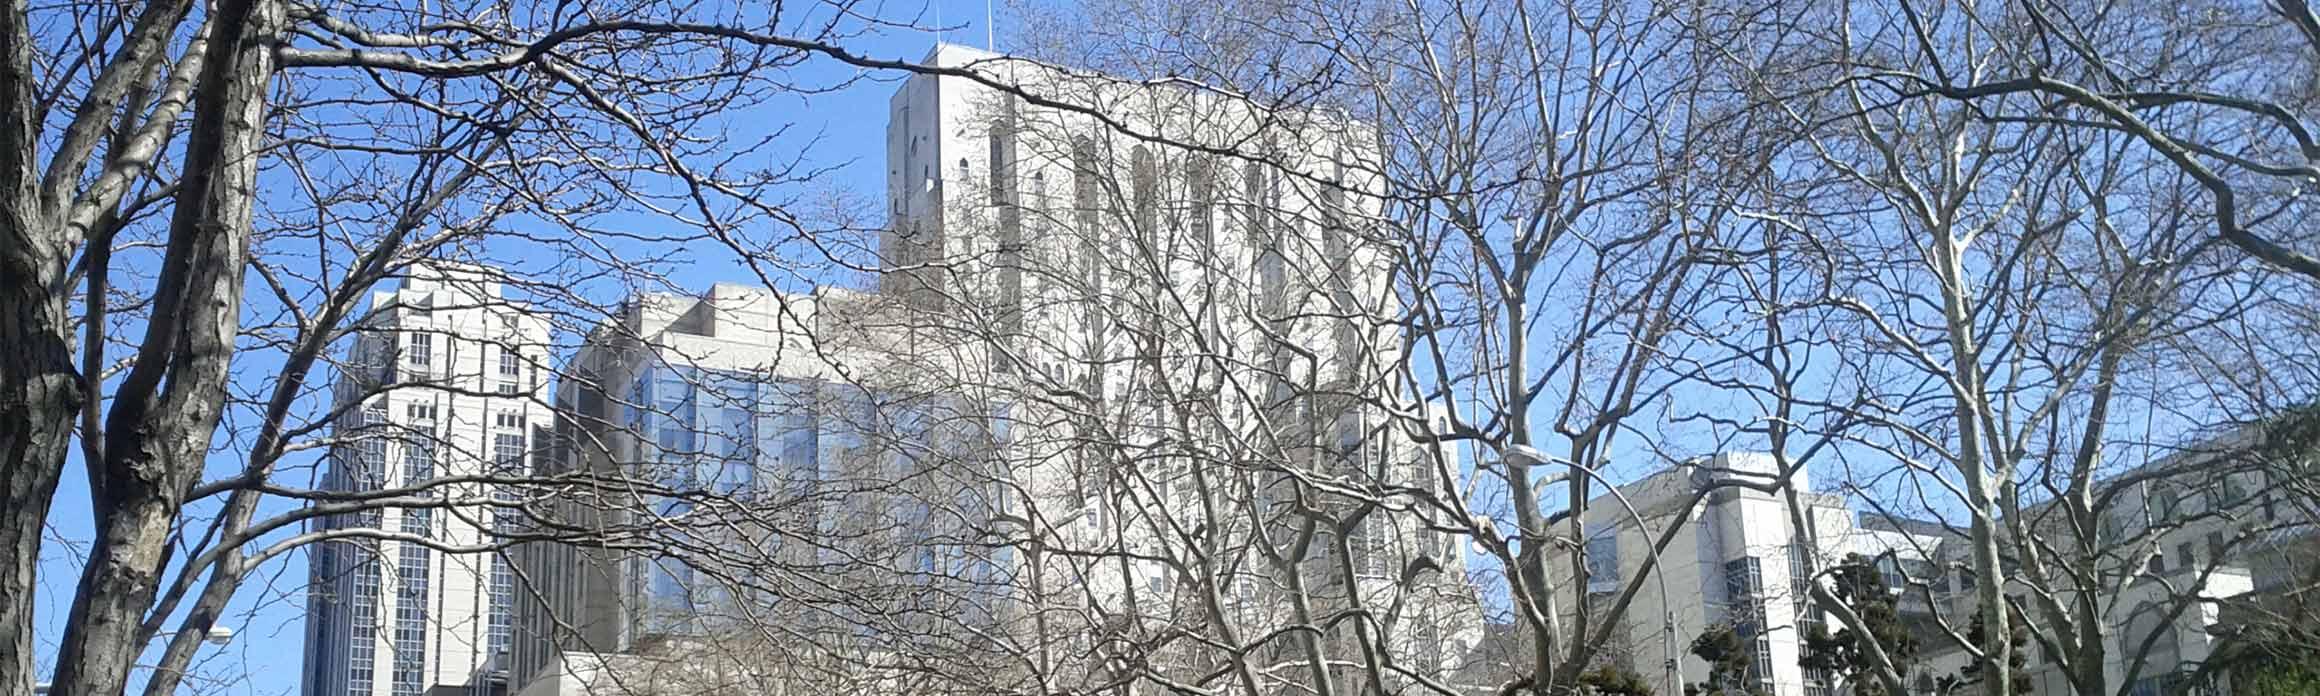 Exterior of CPO building.